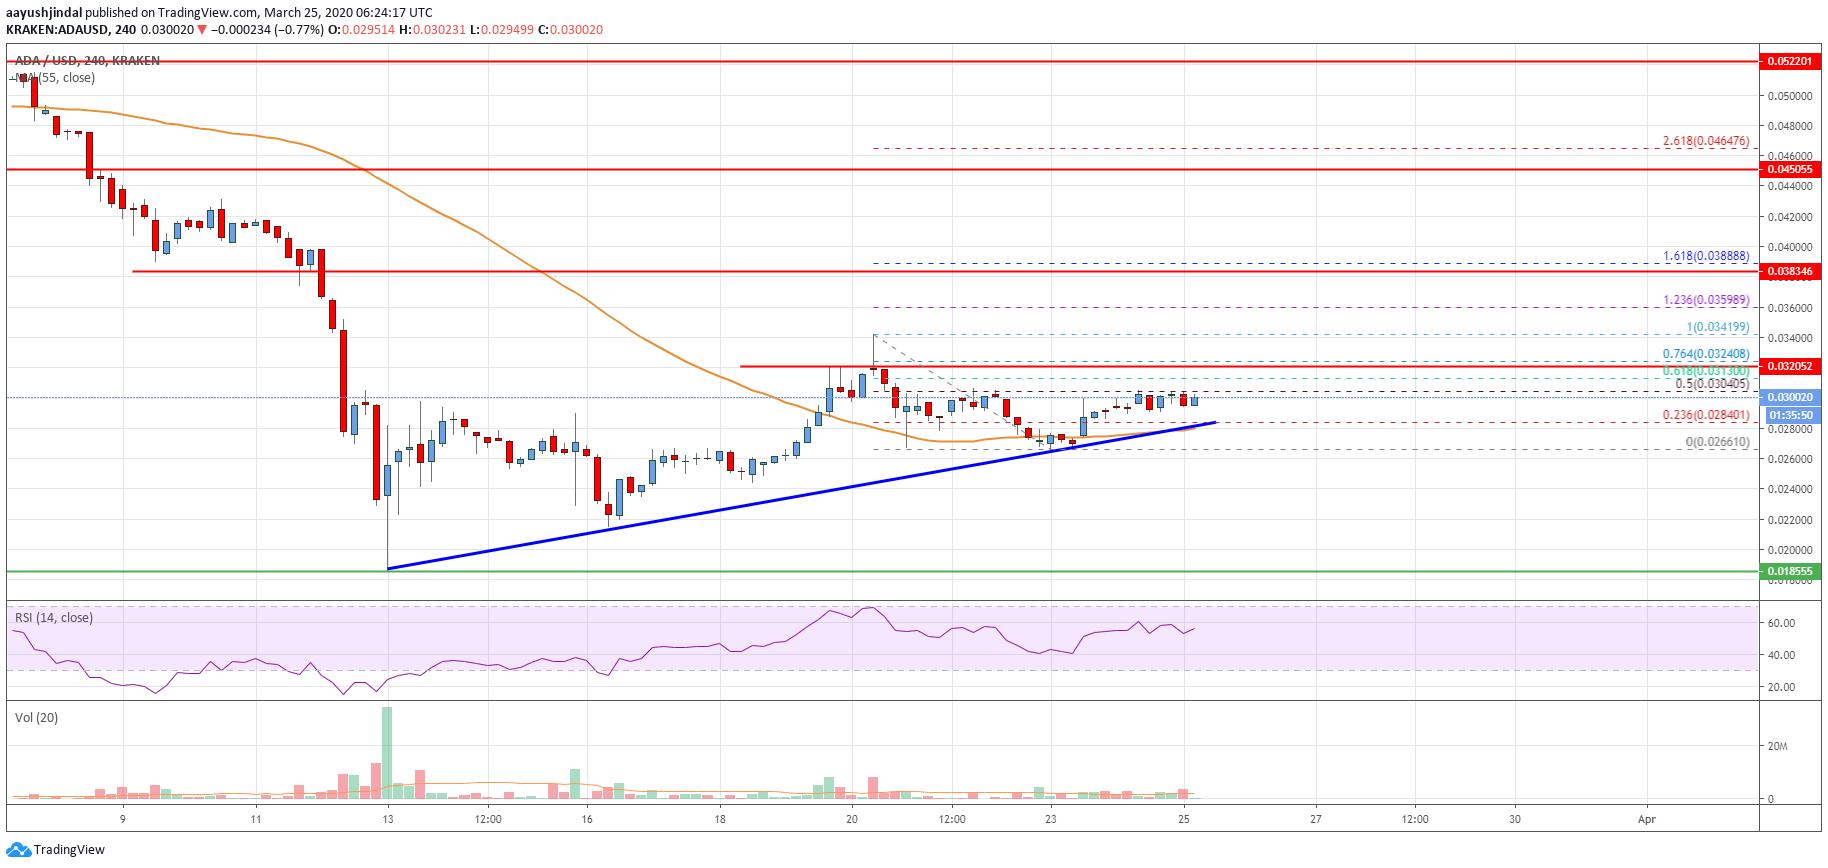 Cardano (ADA) Price Analysis: Approaching Next Key Break To $0.04?